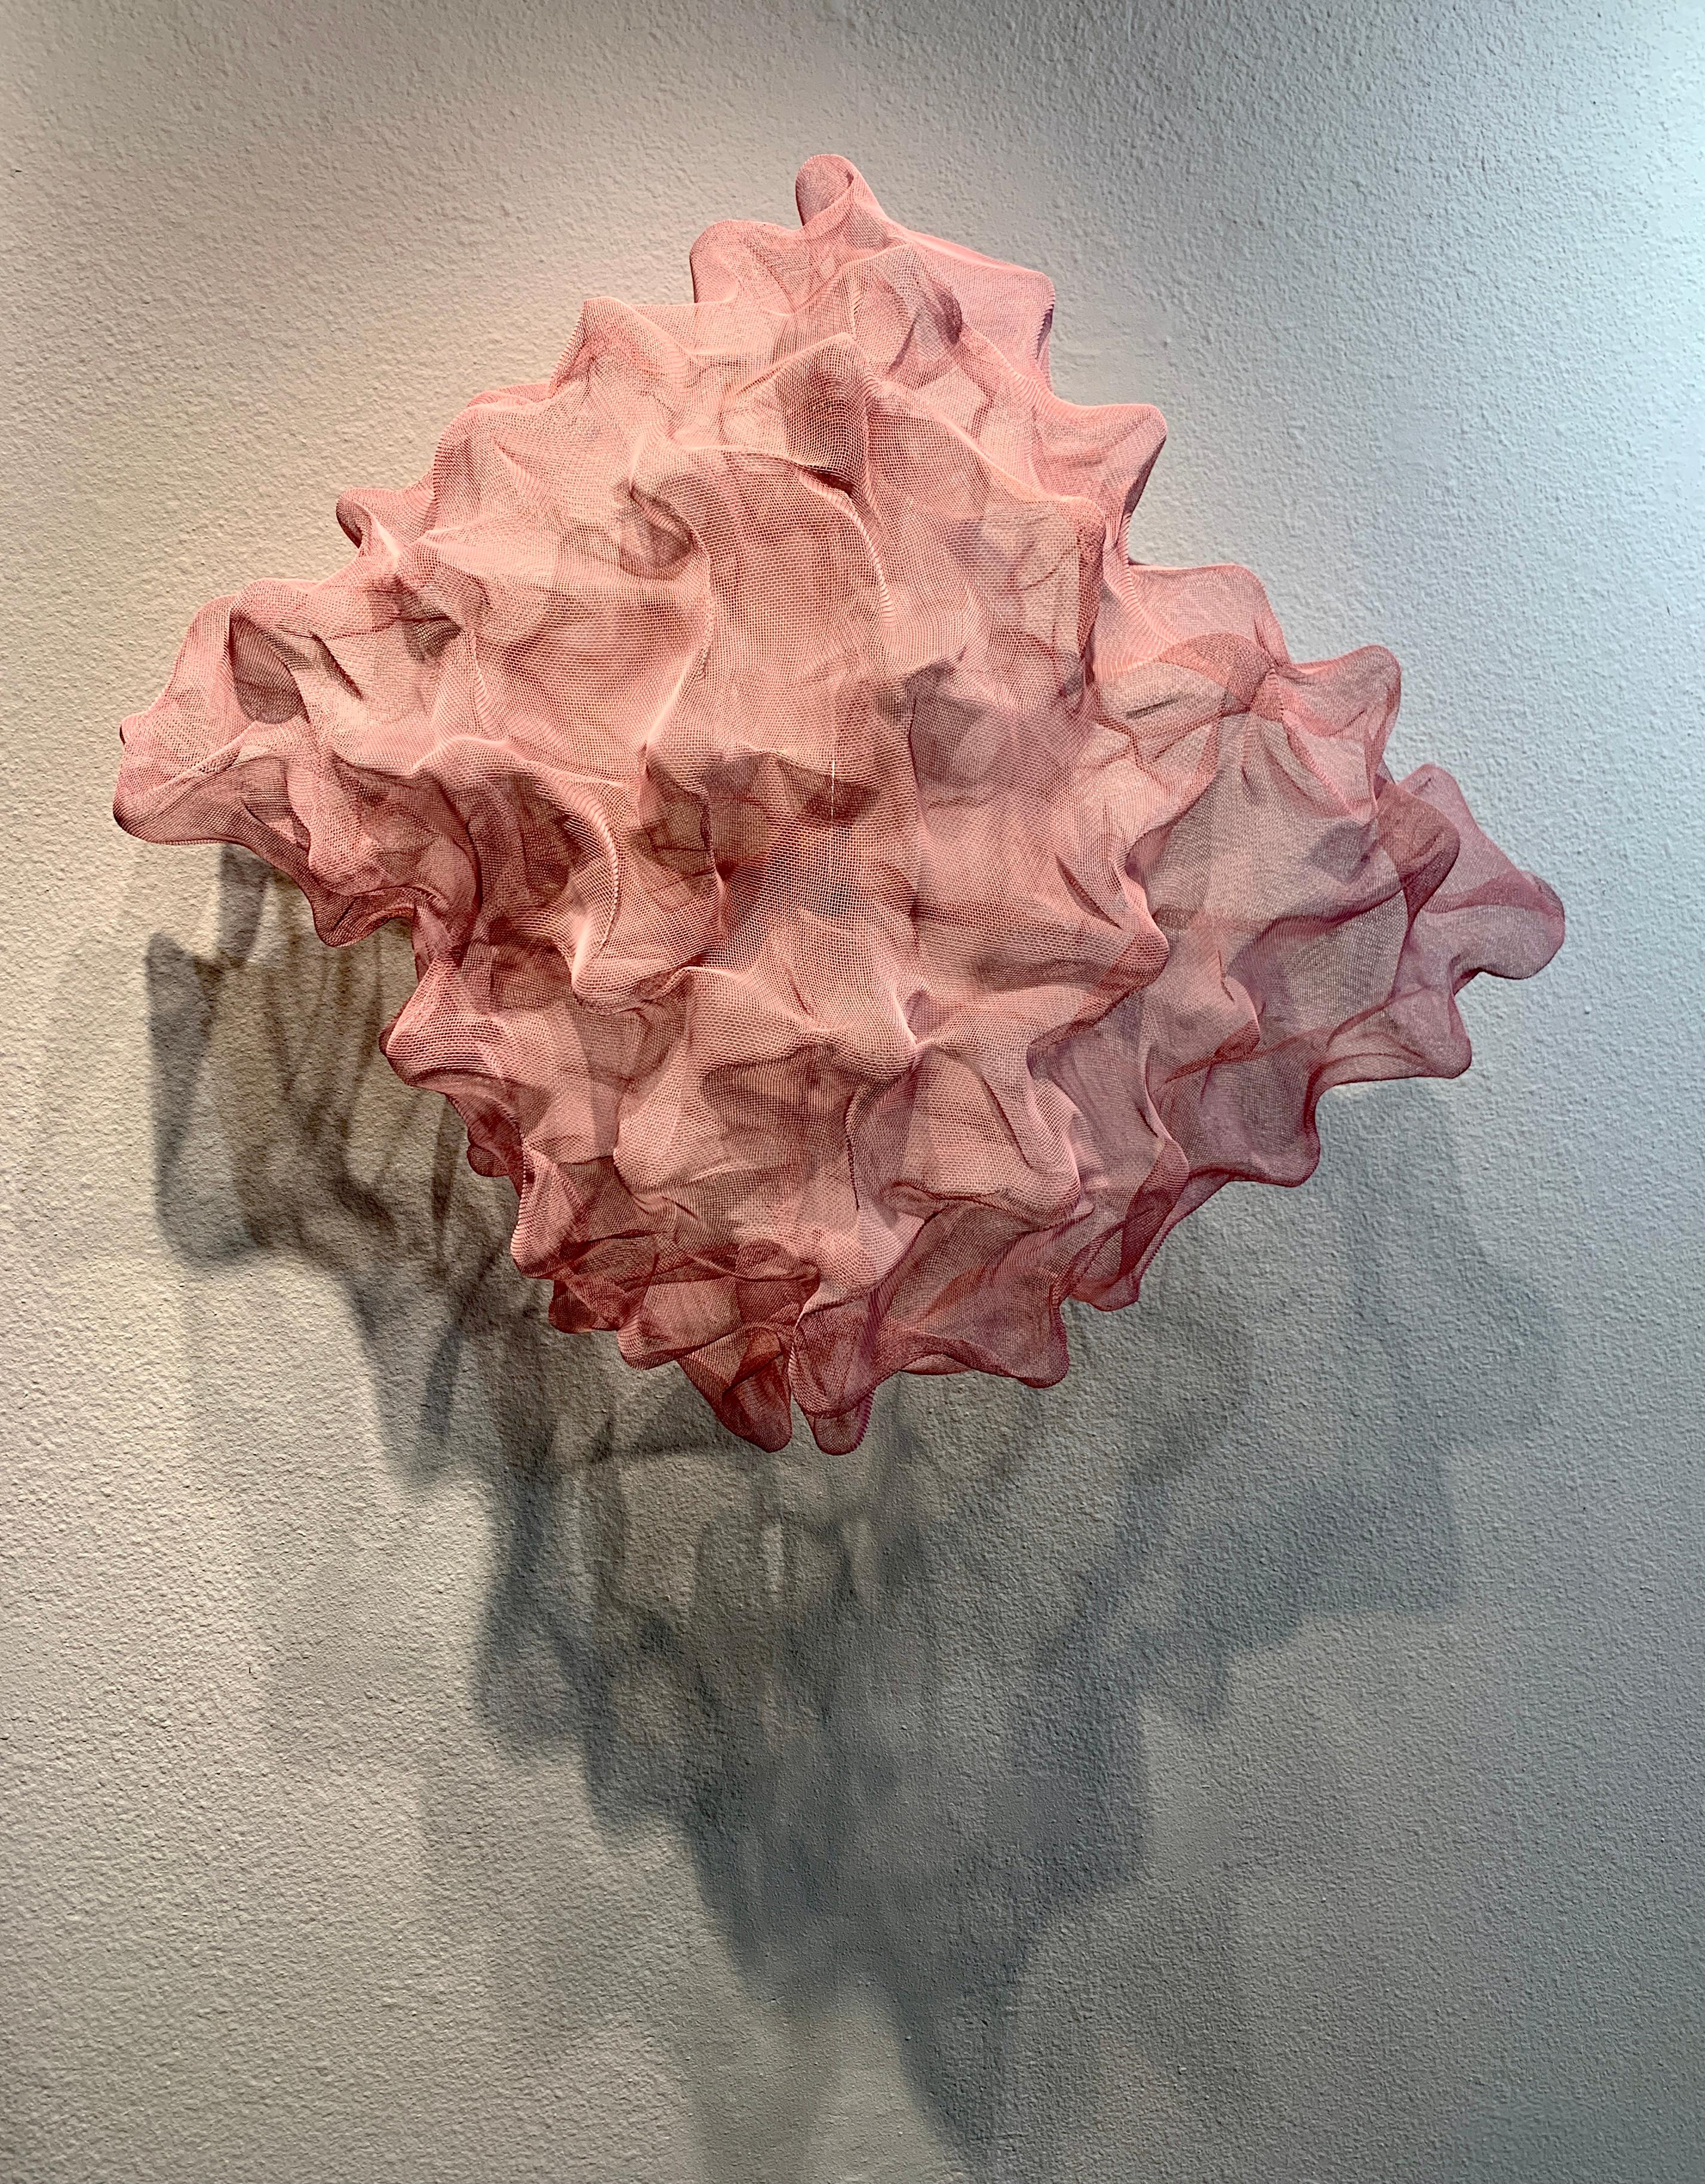 Cotton Candy Cumulus III, Atticus Adams Pink Metal Mesh Sculpture Screen